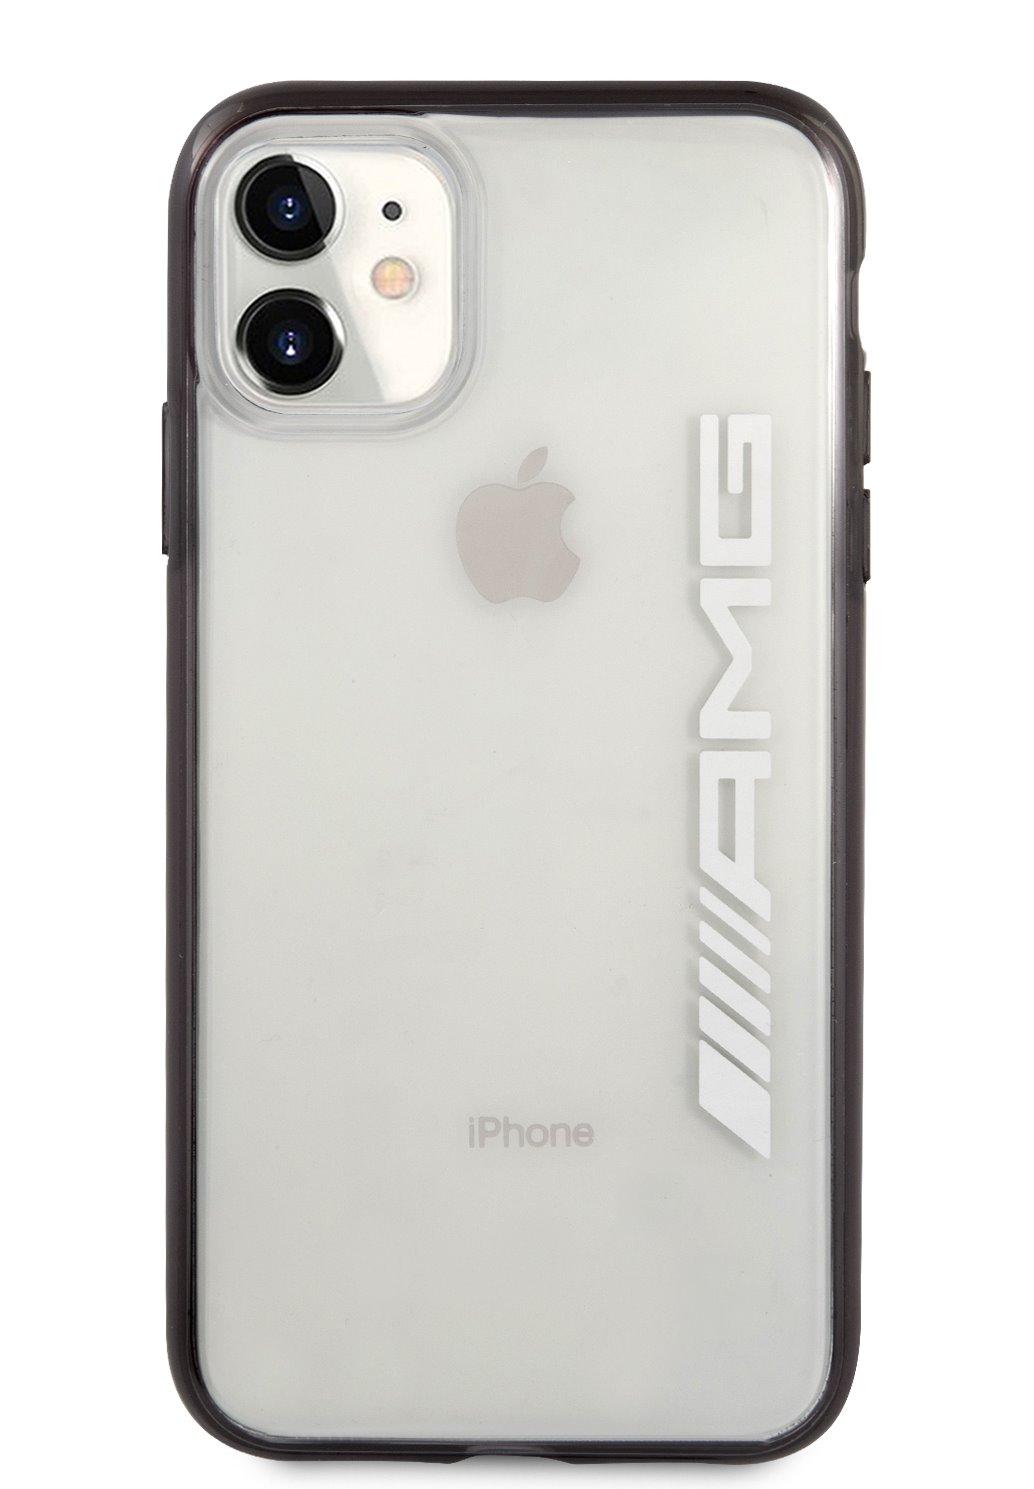 AMHCN61AESLBK AMG Metallic Black Edges Kryt pro iPhone 11 Transparent 3666339014445